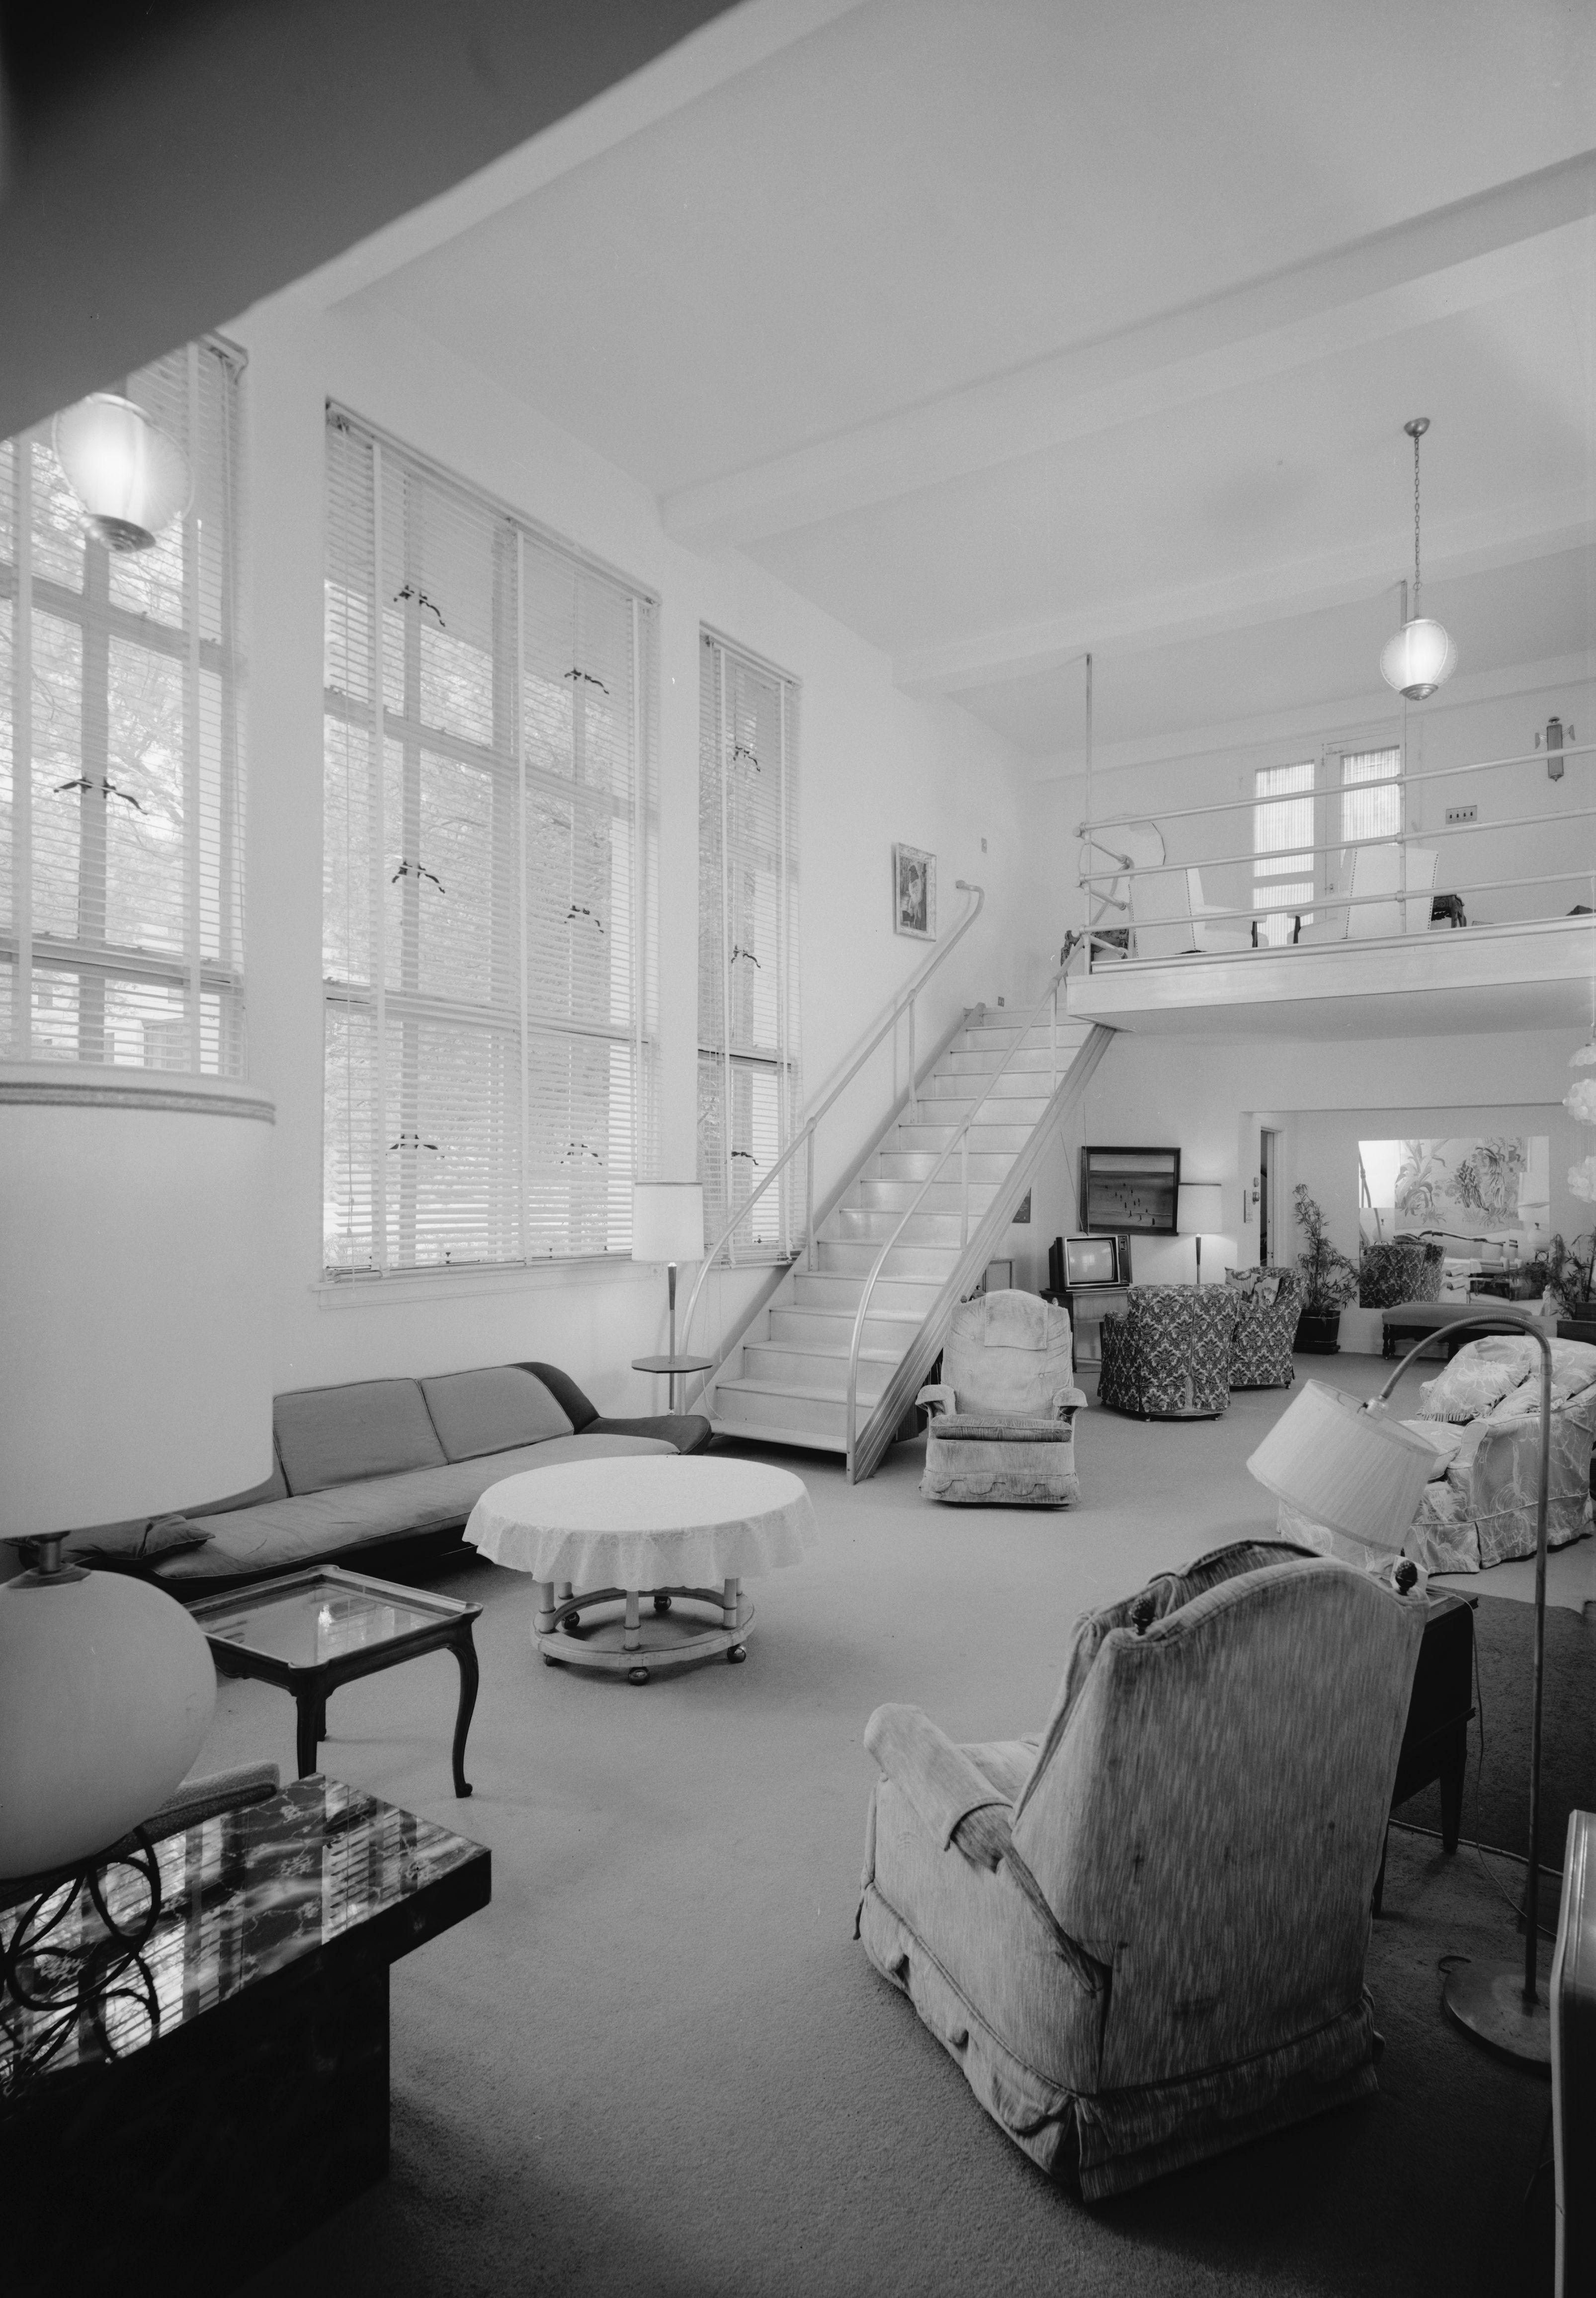 file:florida tropical house interior - wikimedia commons